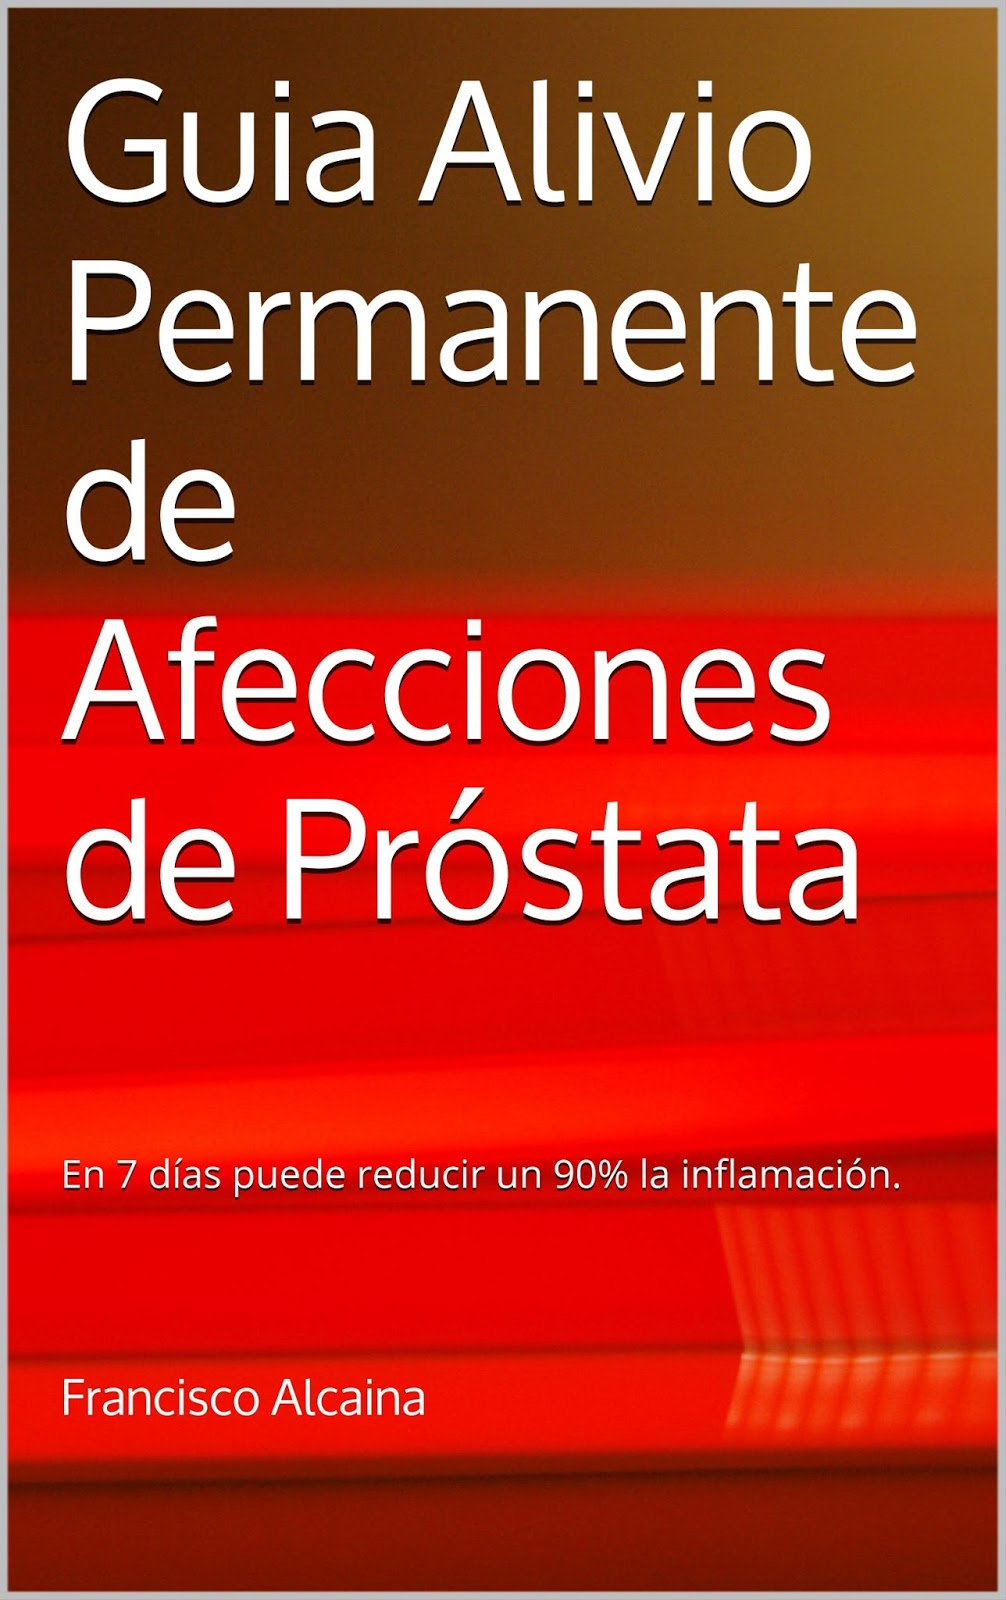 sulfametoxazol para la prostatitis